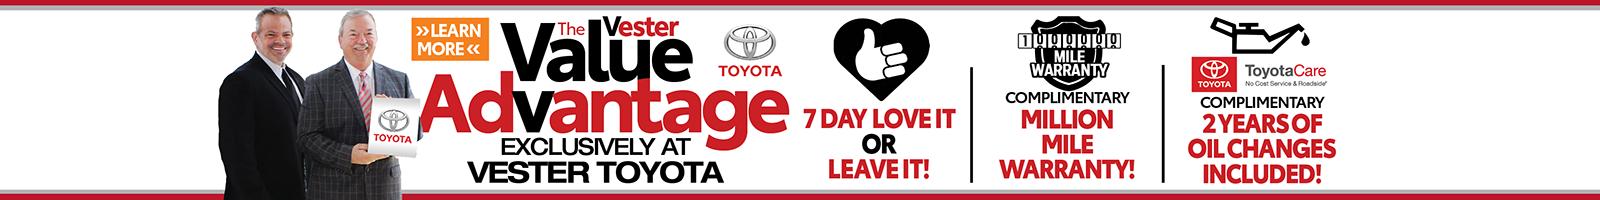 Value Advantage Toyota